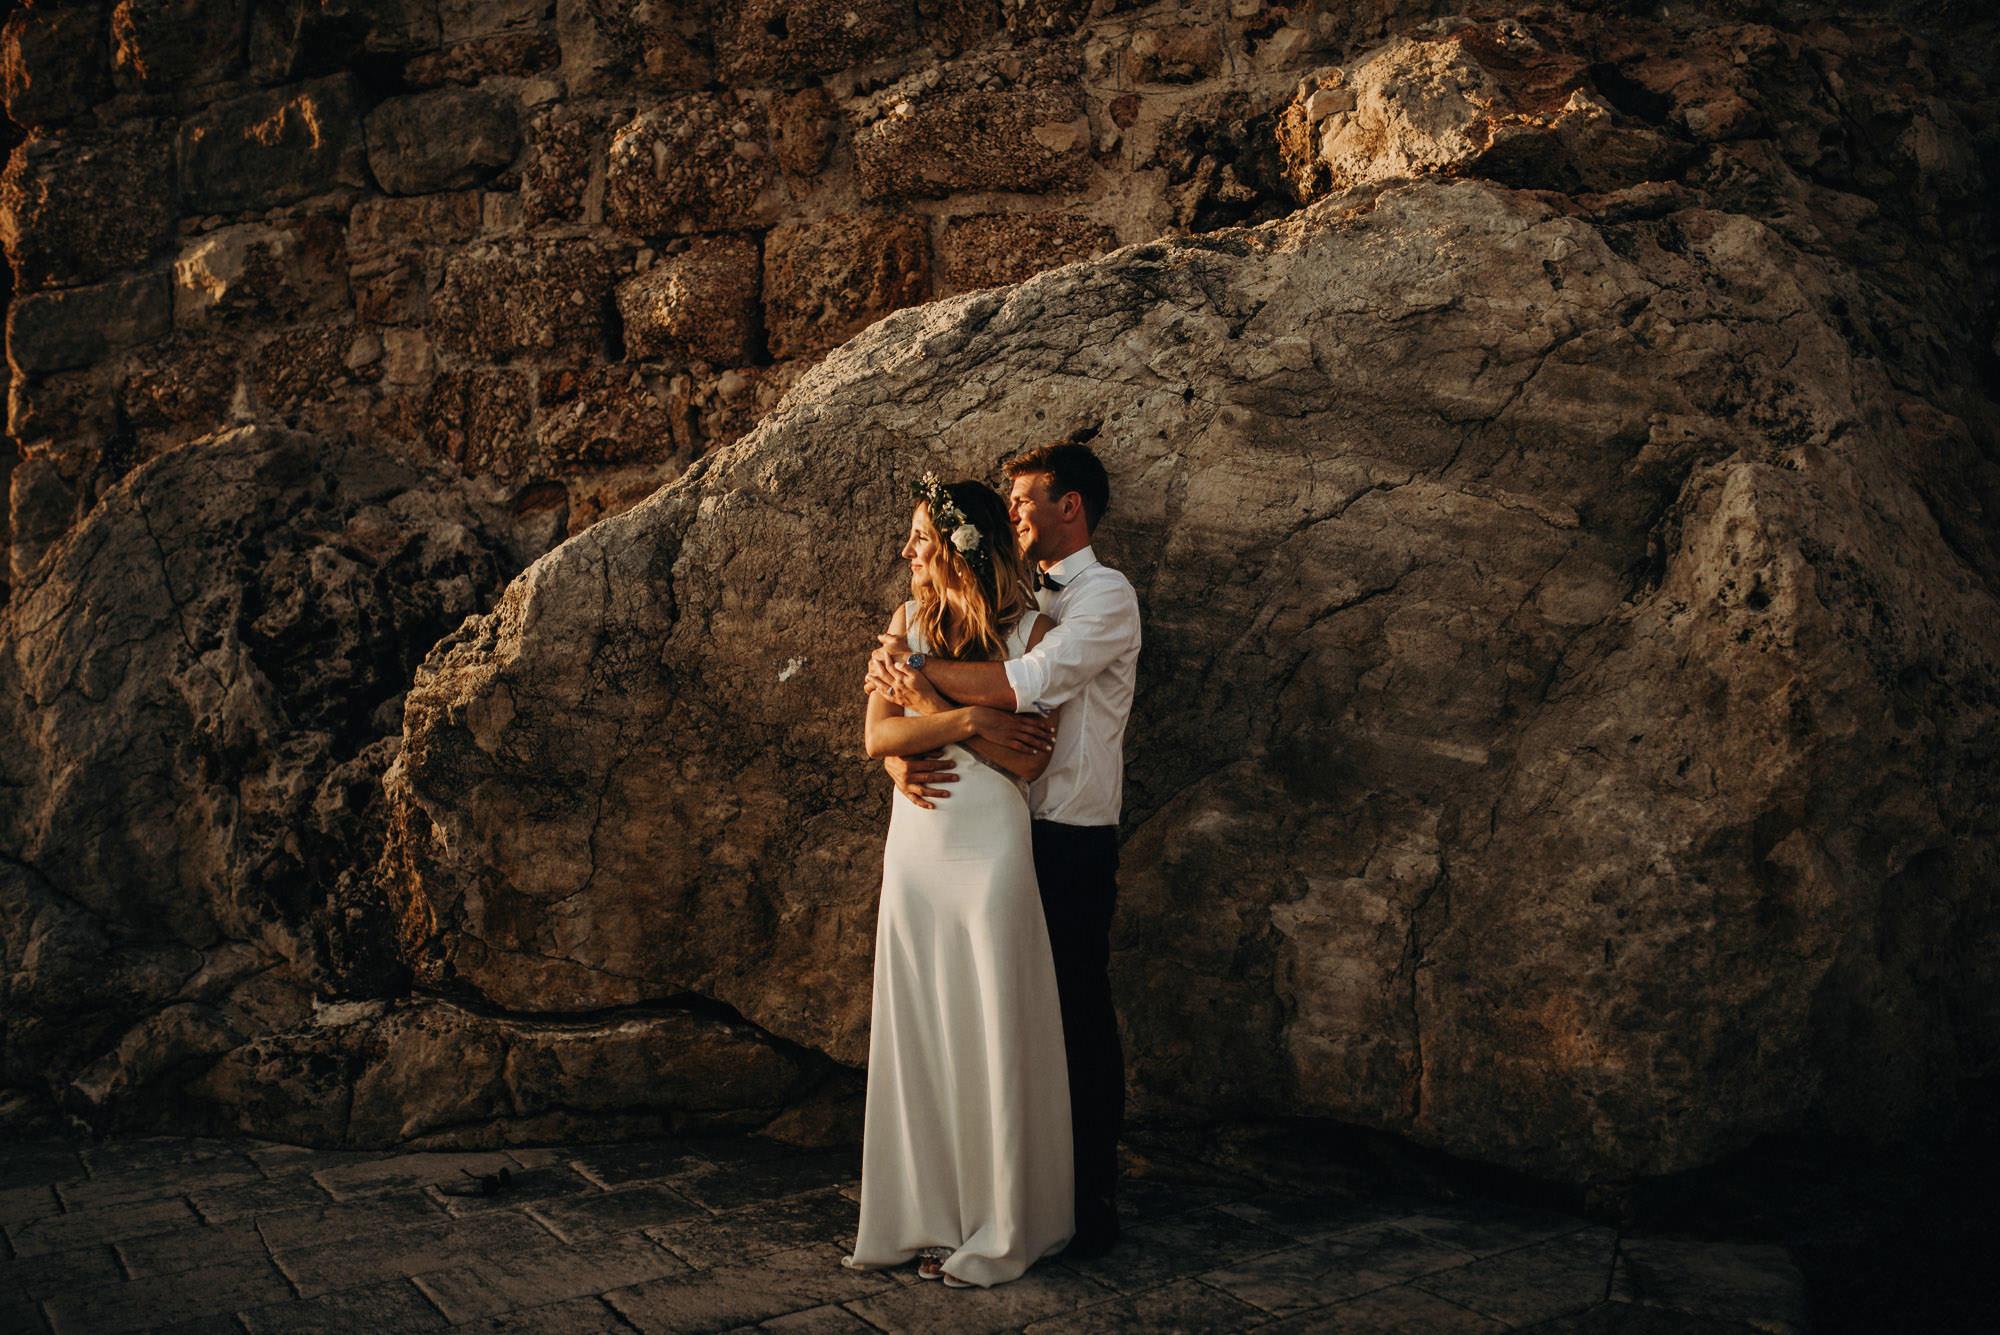 dubrovnik_croatia_wedding_photographer-jere_satamo-destination_weddings-081-web.jpg